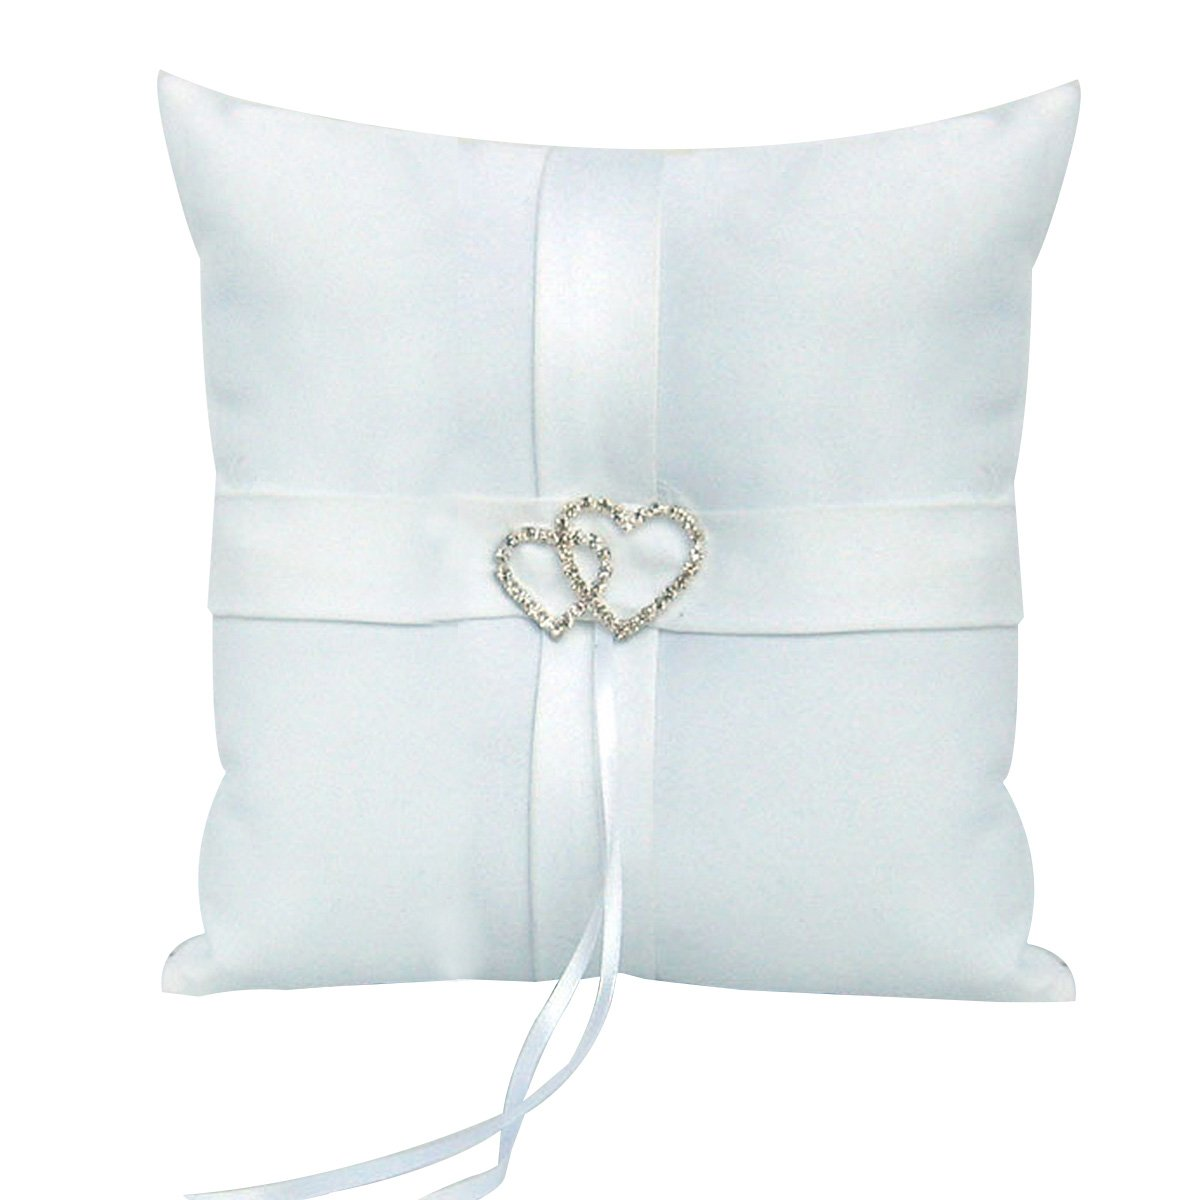 White PIXNOR Rhinestones Wedding Ring Cushion Bearer Pillow with Satin Ribbon 10*10cm